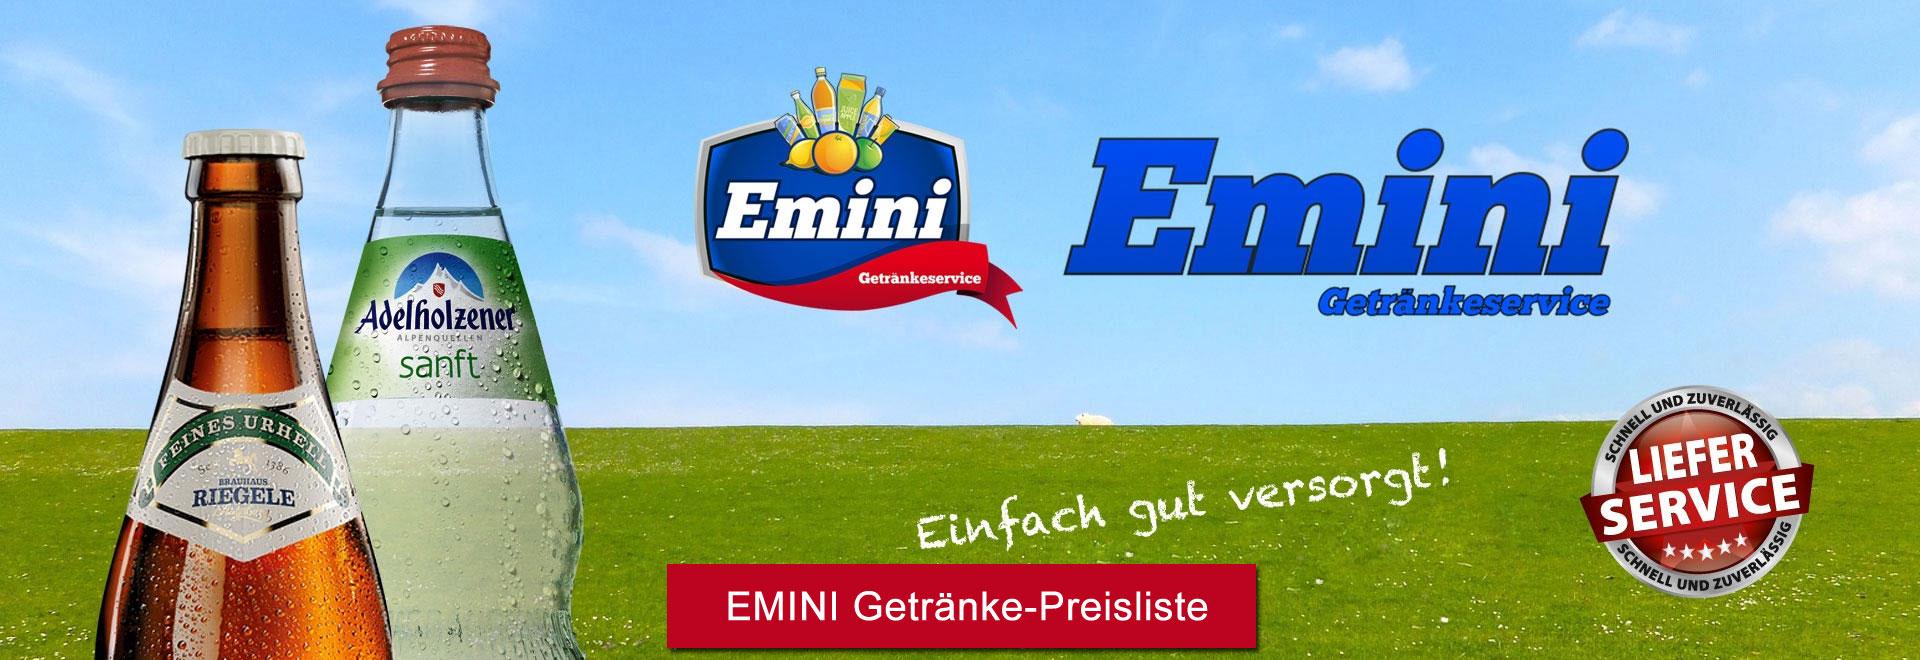 Getränkeservice Emini Augsburg